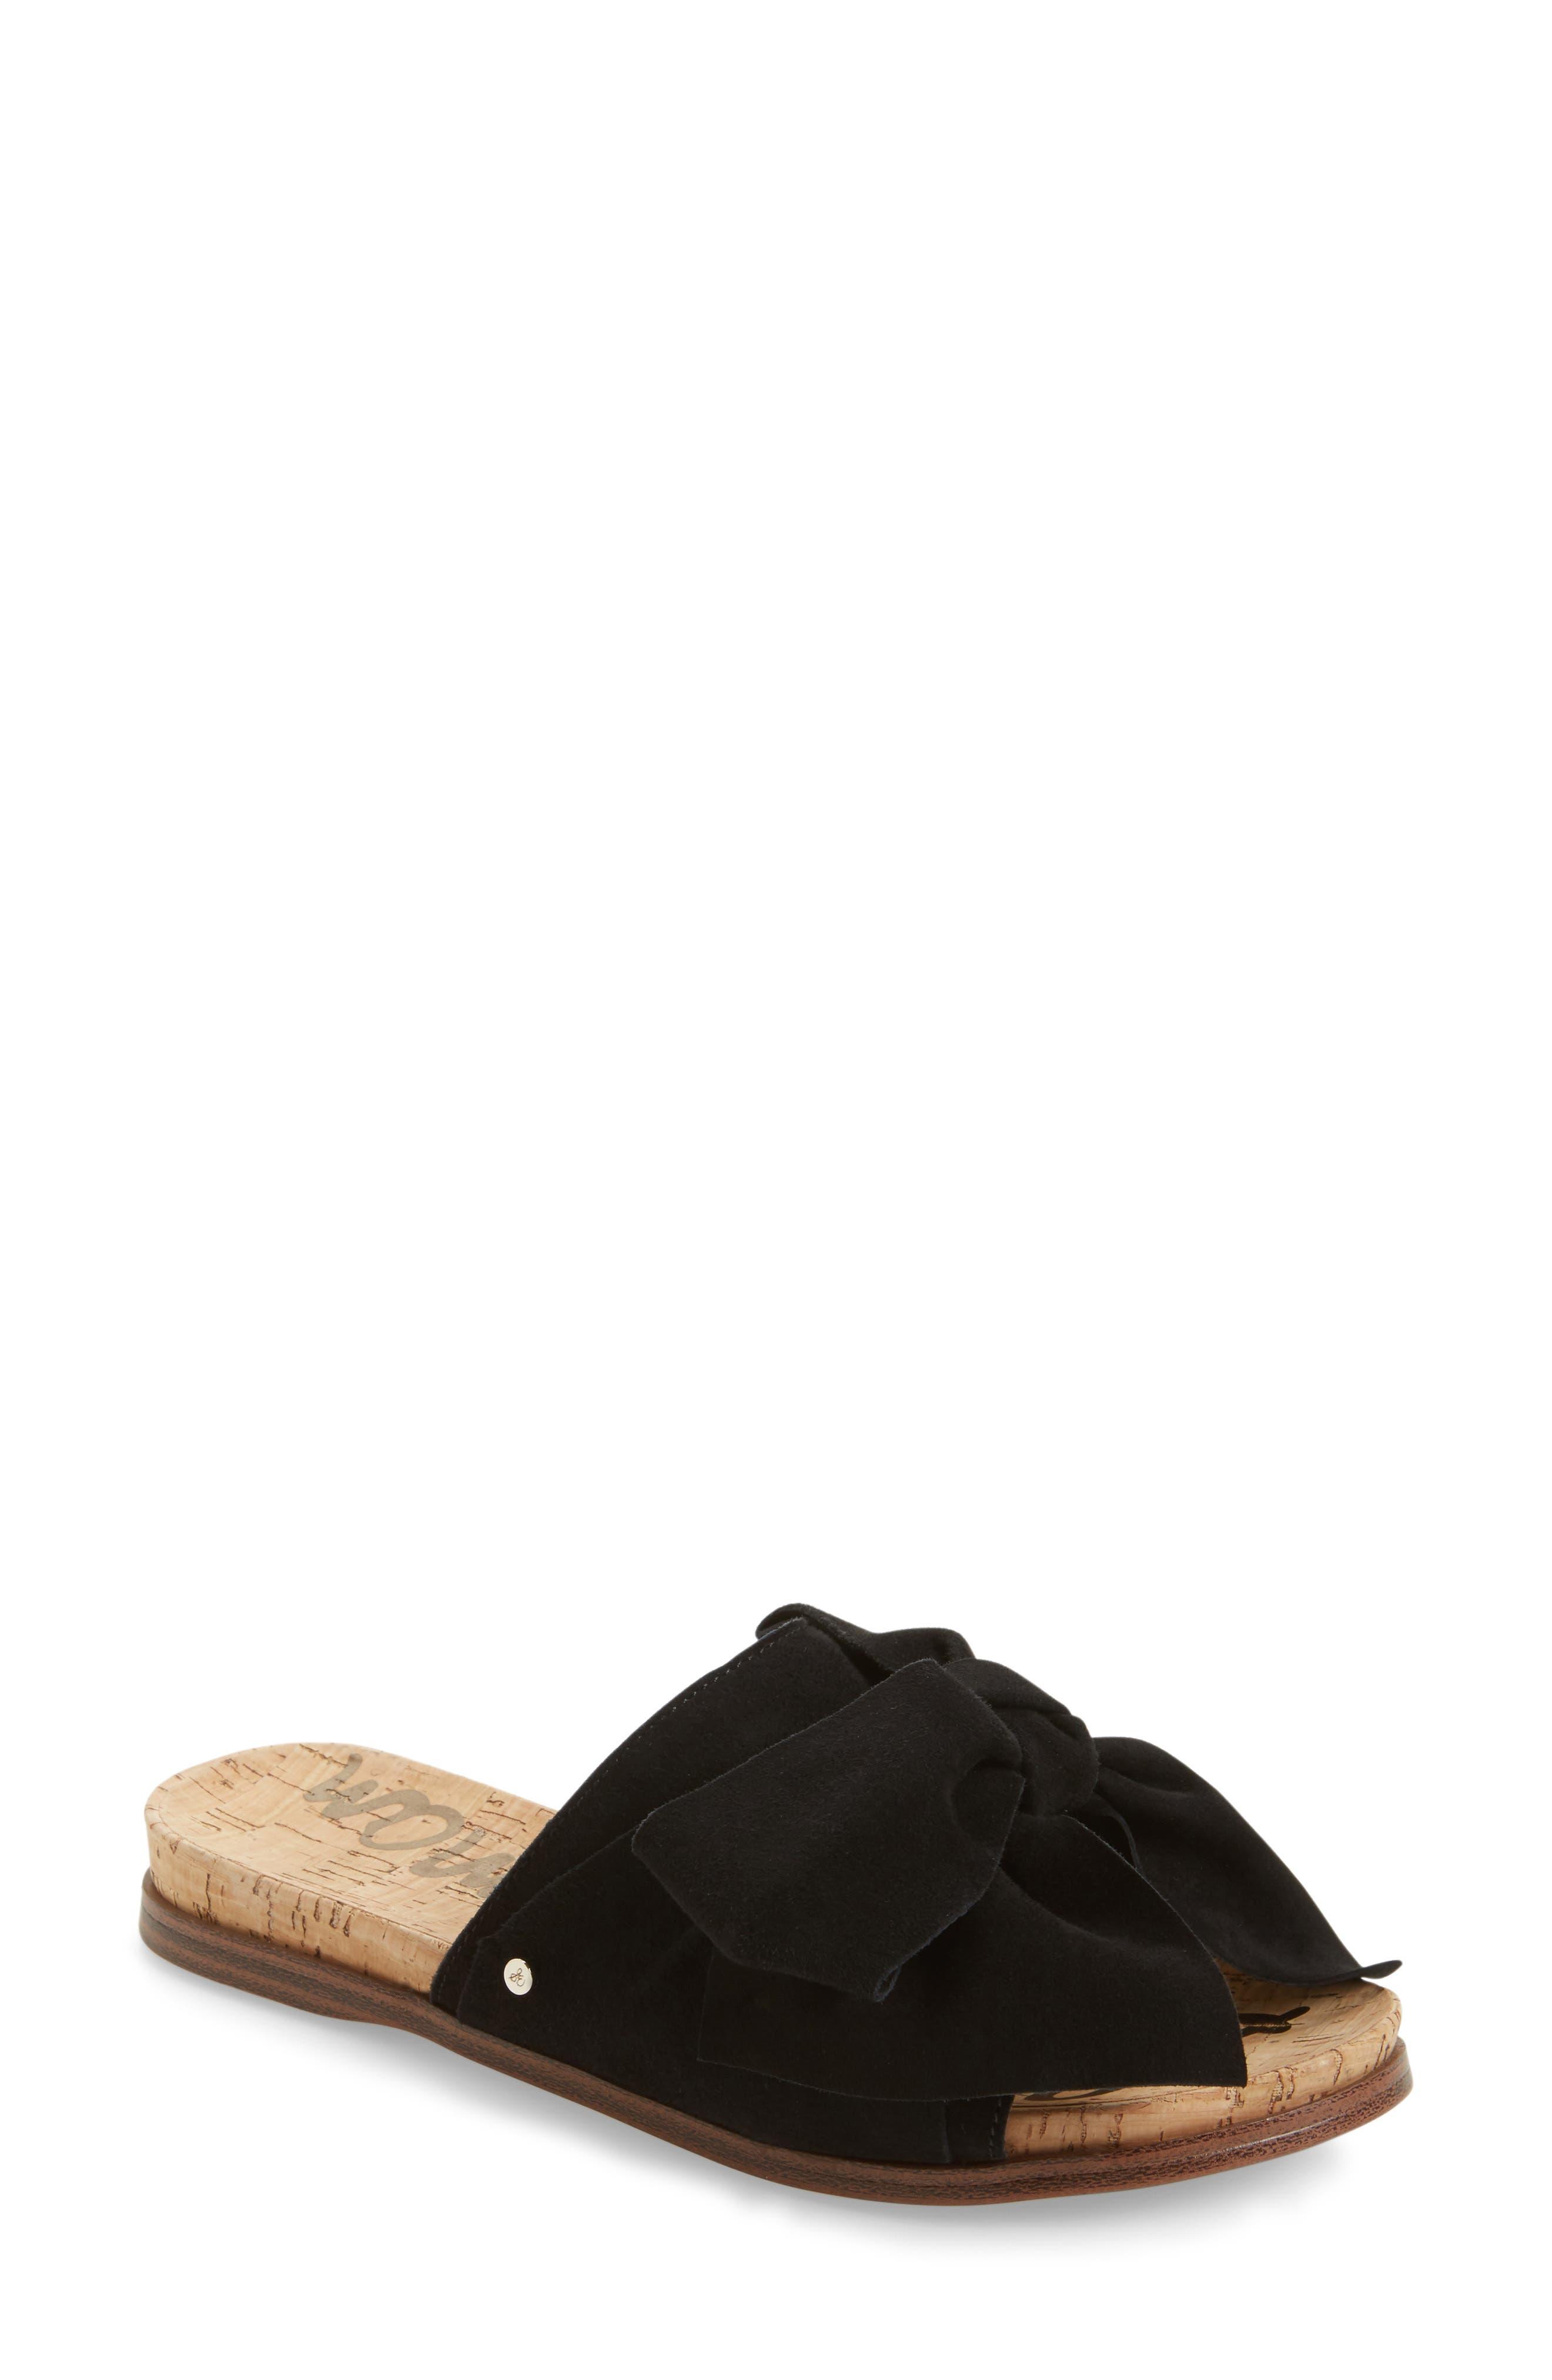 SAM EDELMAN Henna Slide Sandal, Main, color, 001